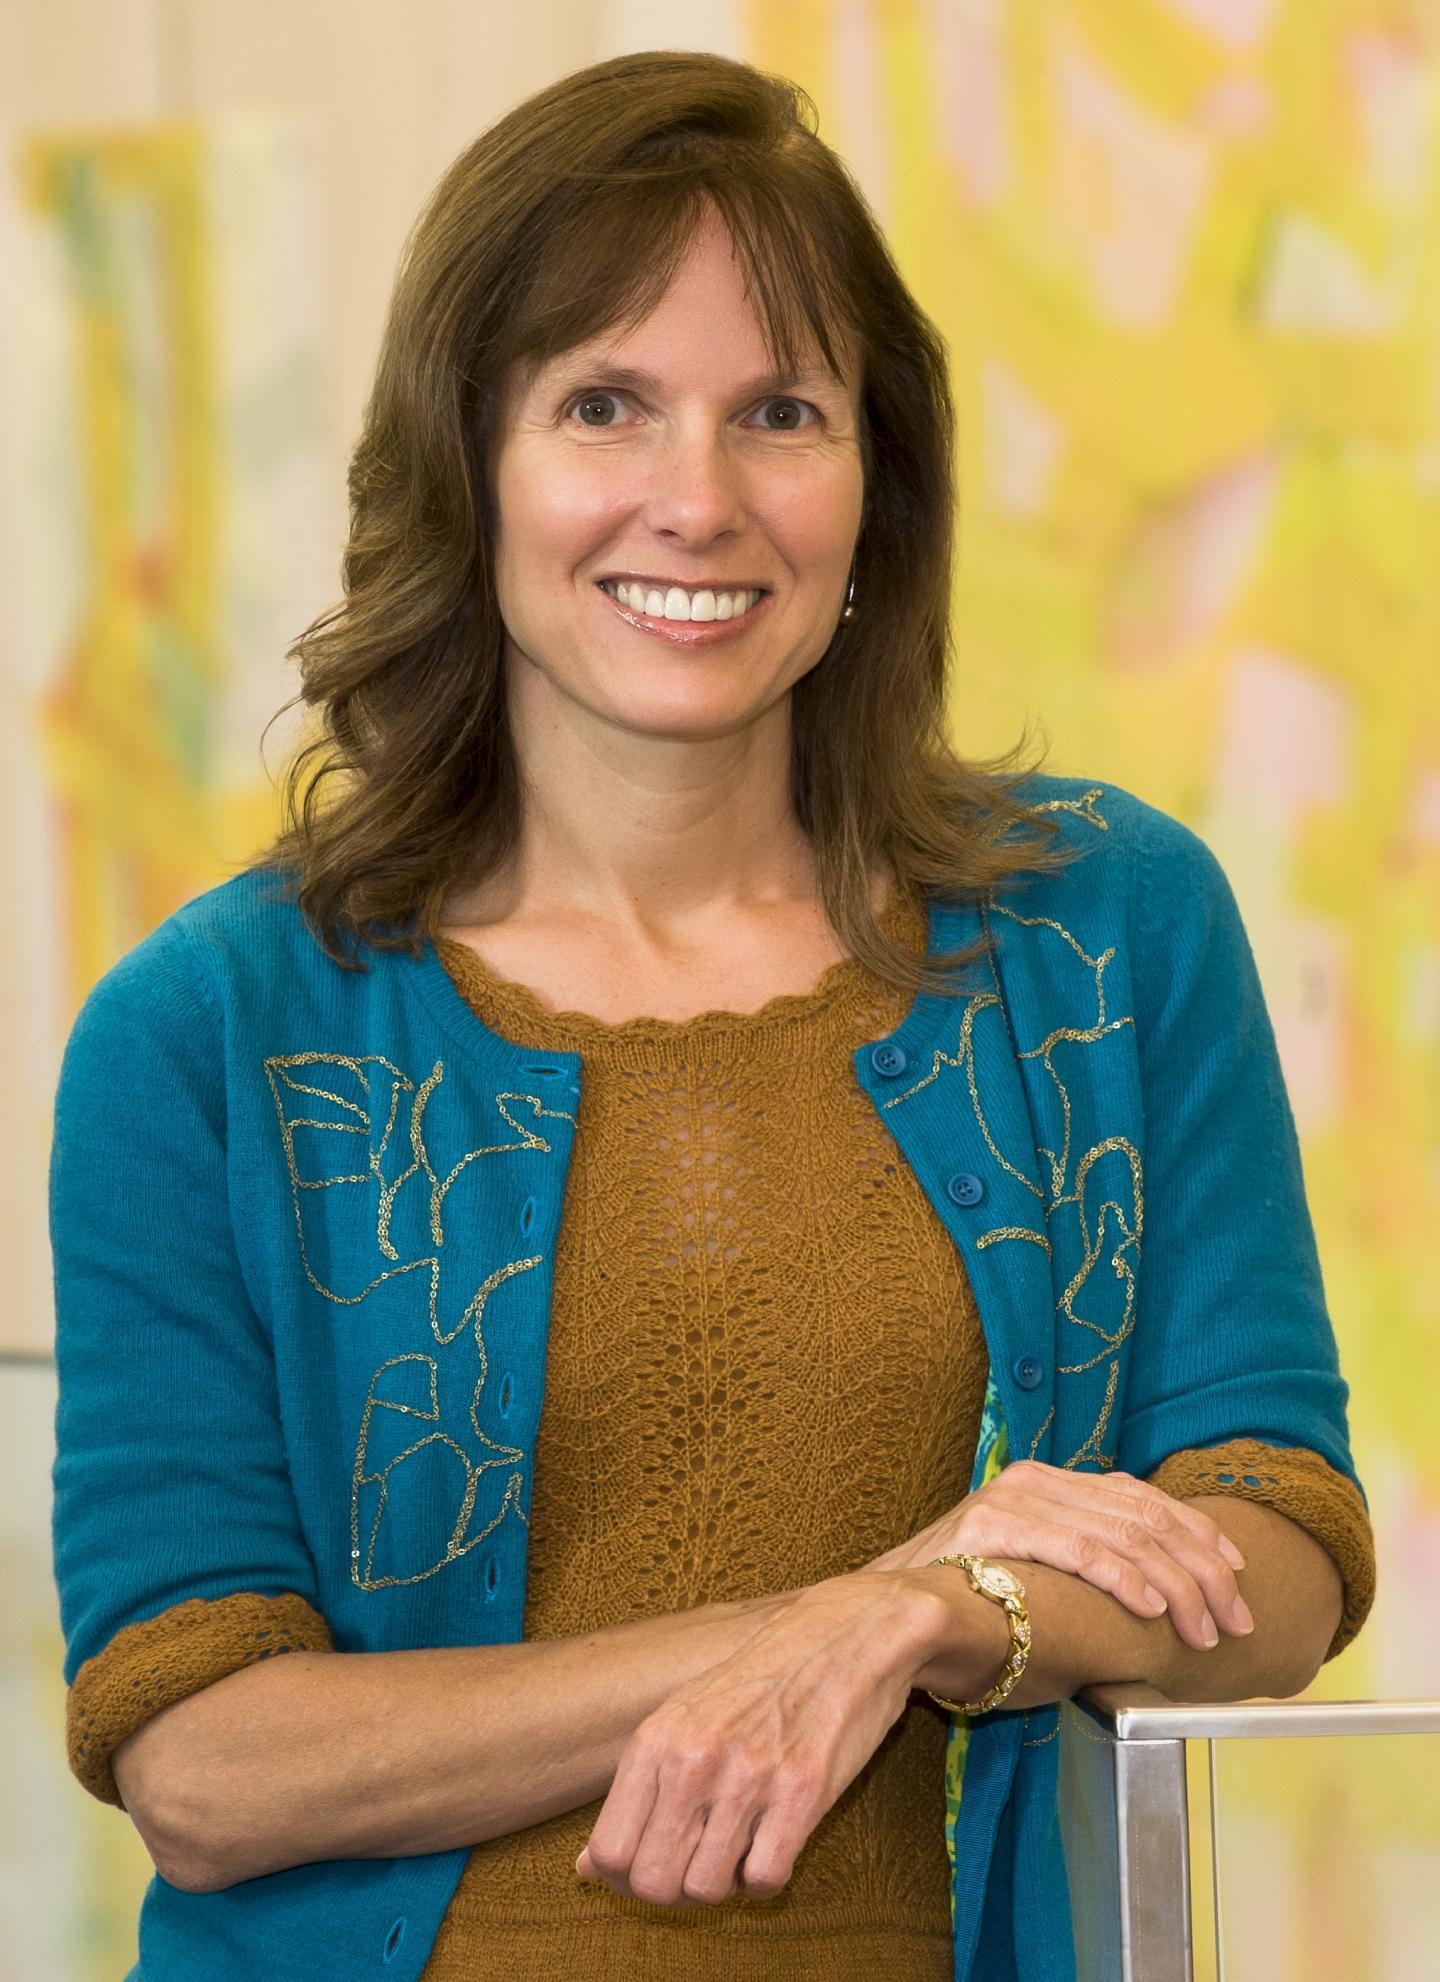 Cathy Bradley, Ph.D., University of Colorado Cancer Center